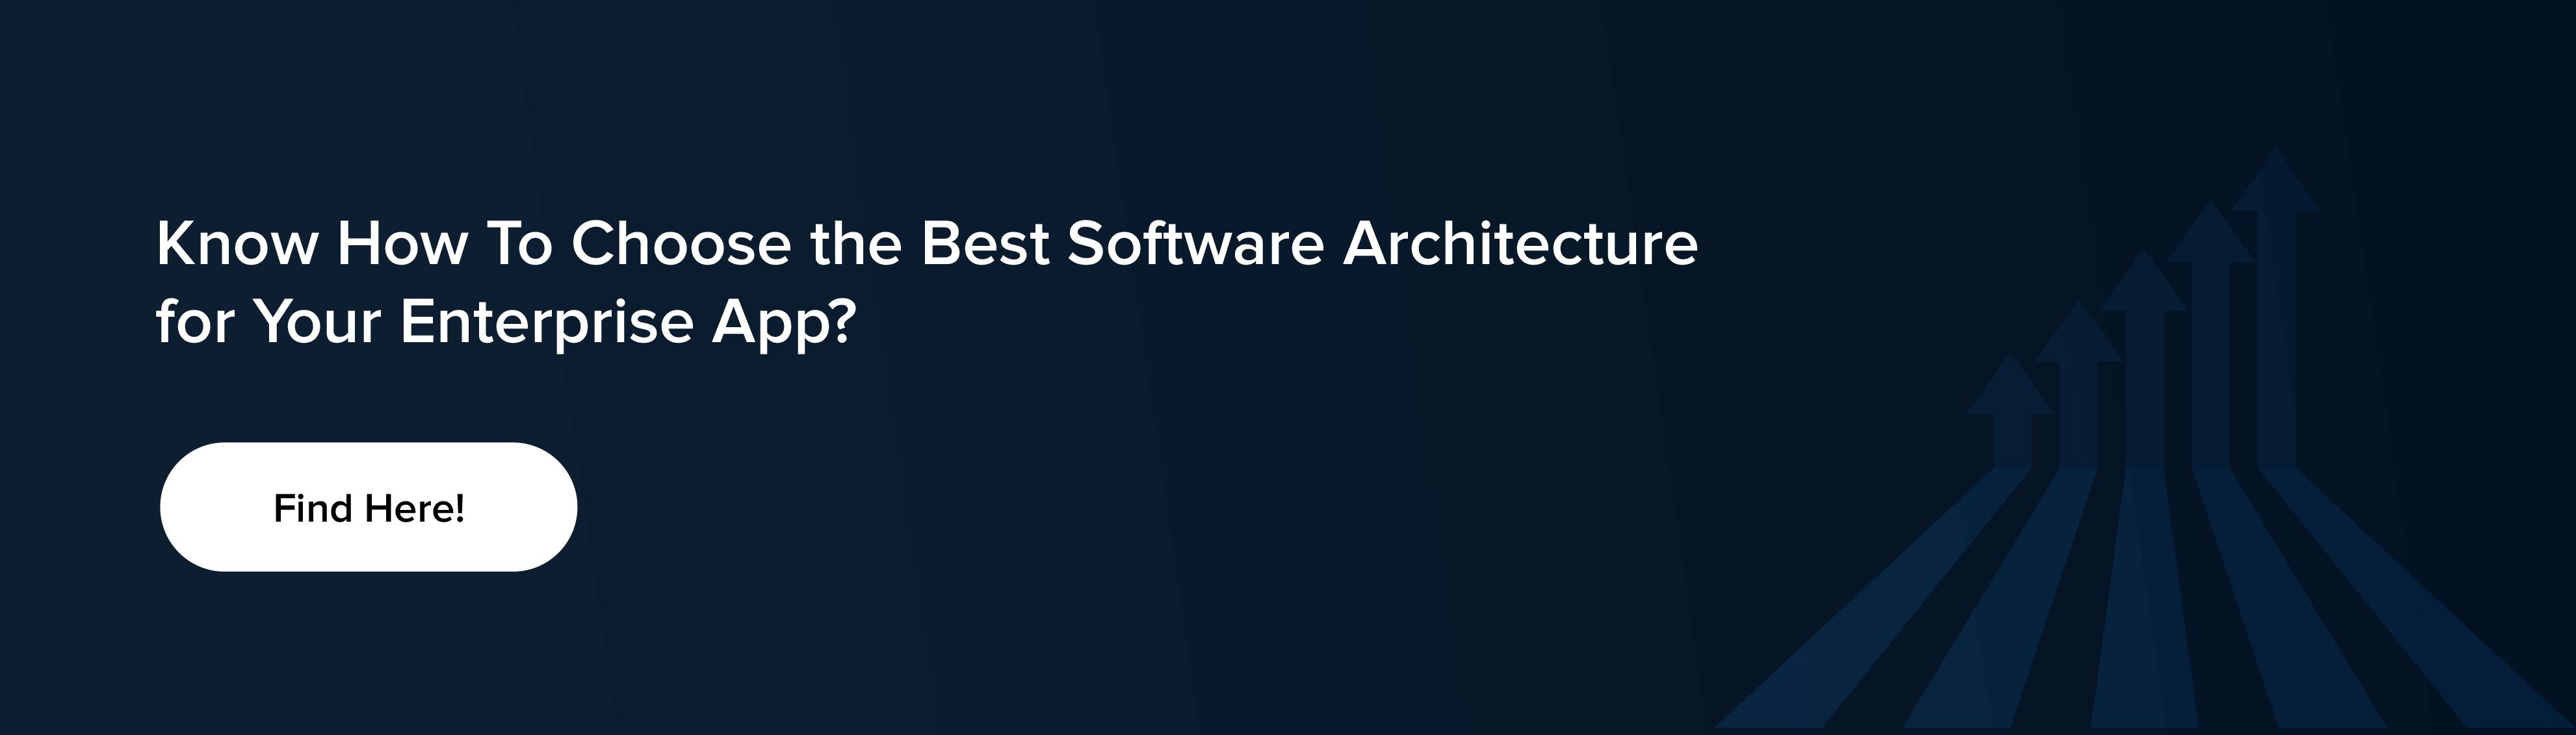 best software architecture for enterprize app